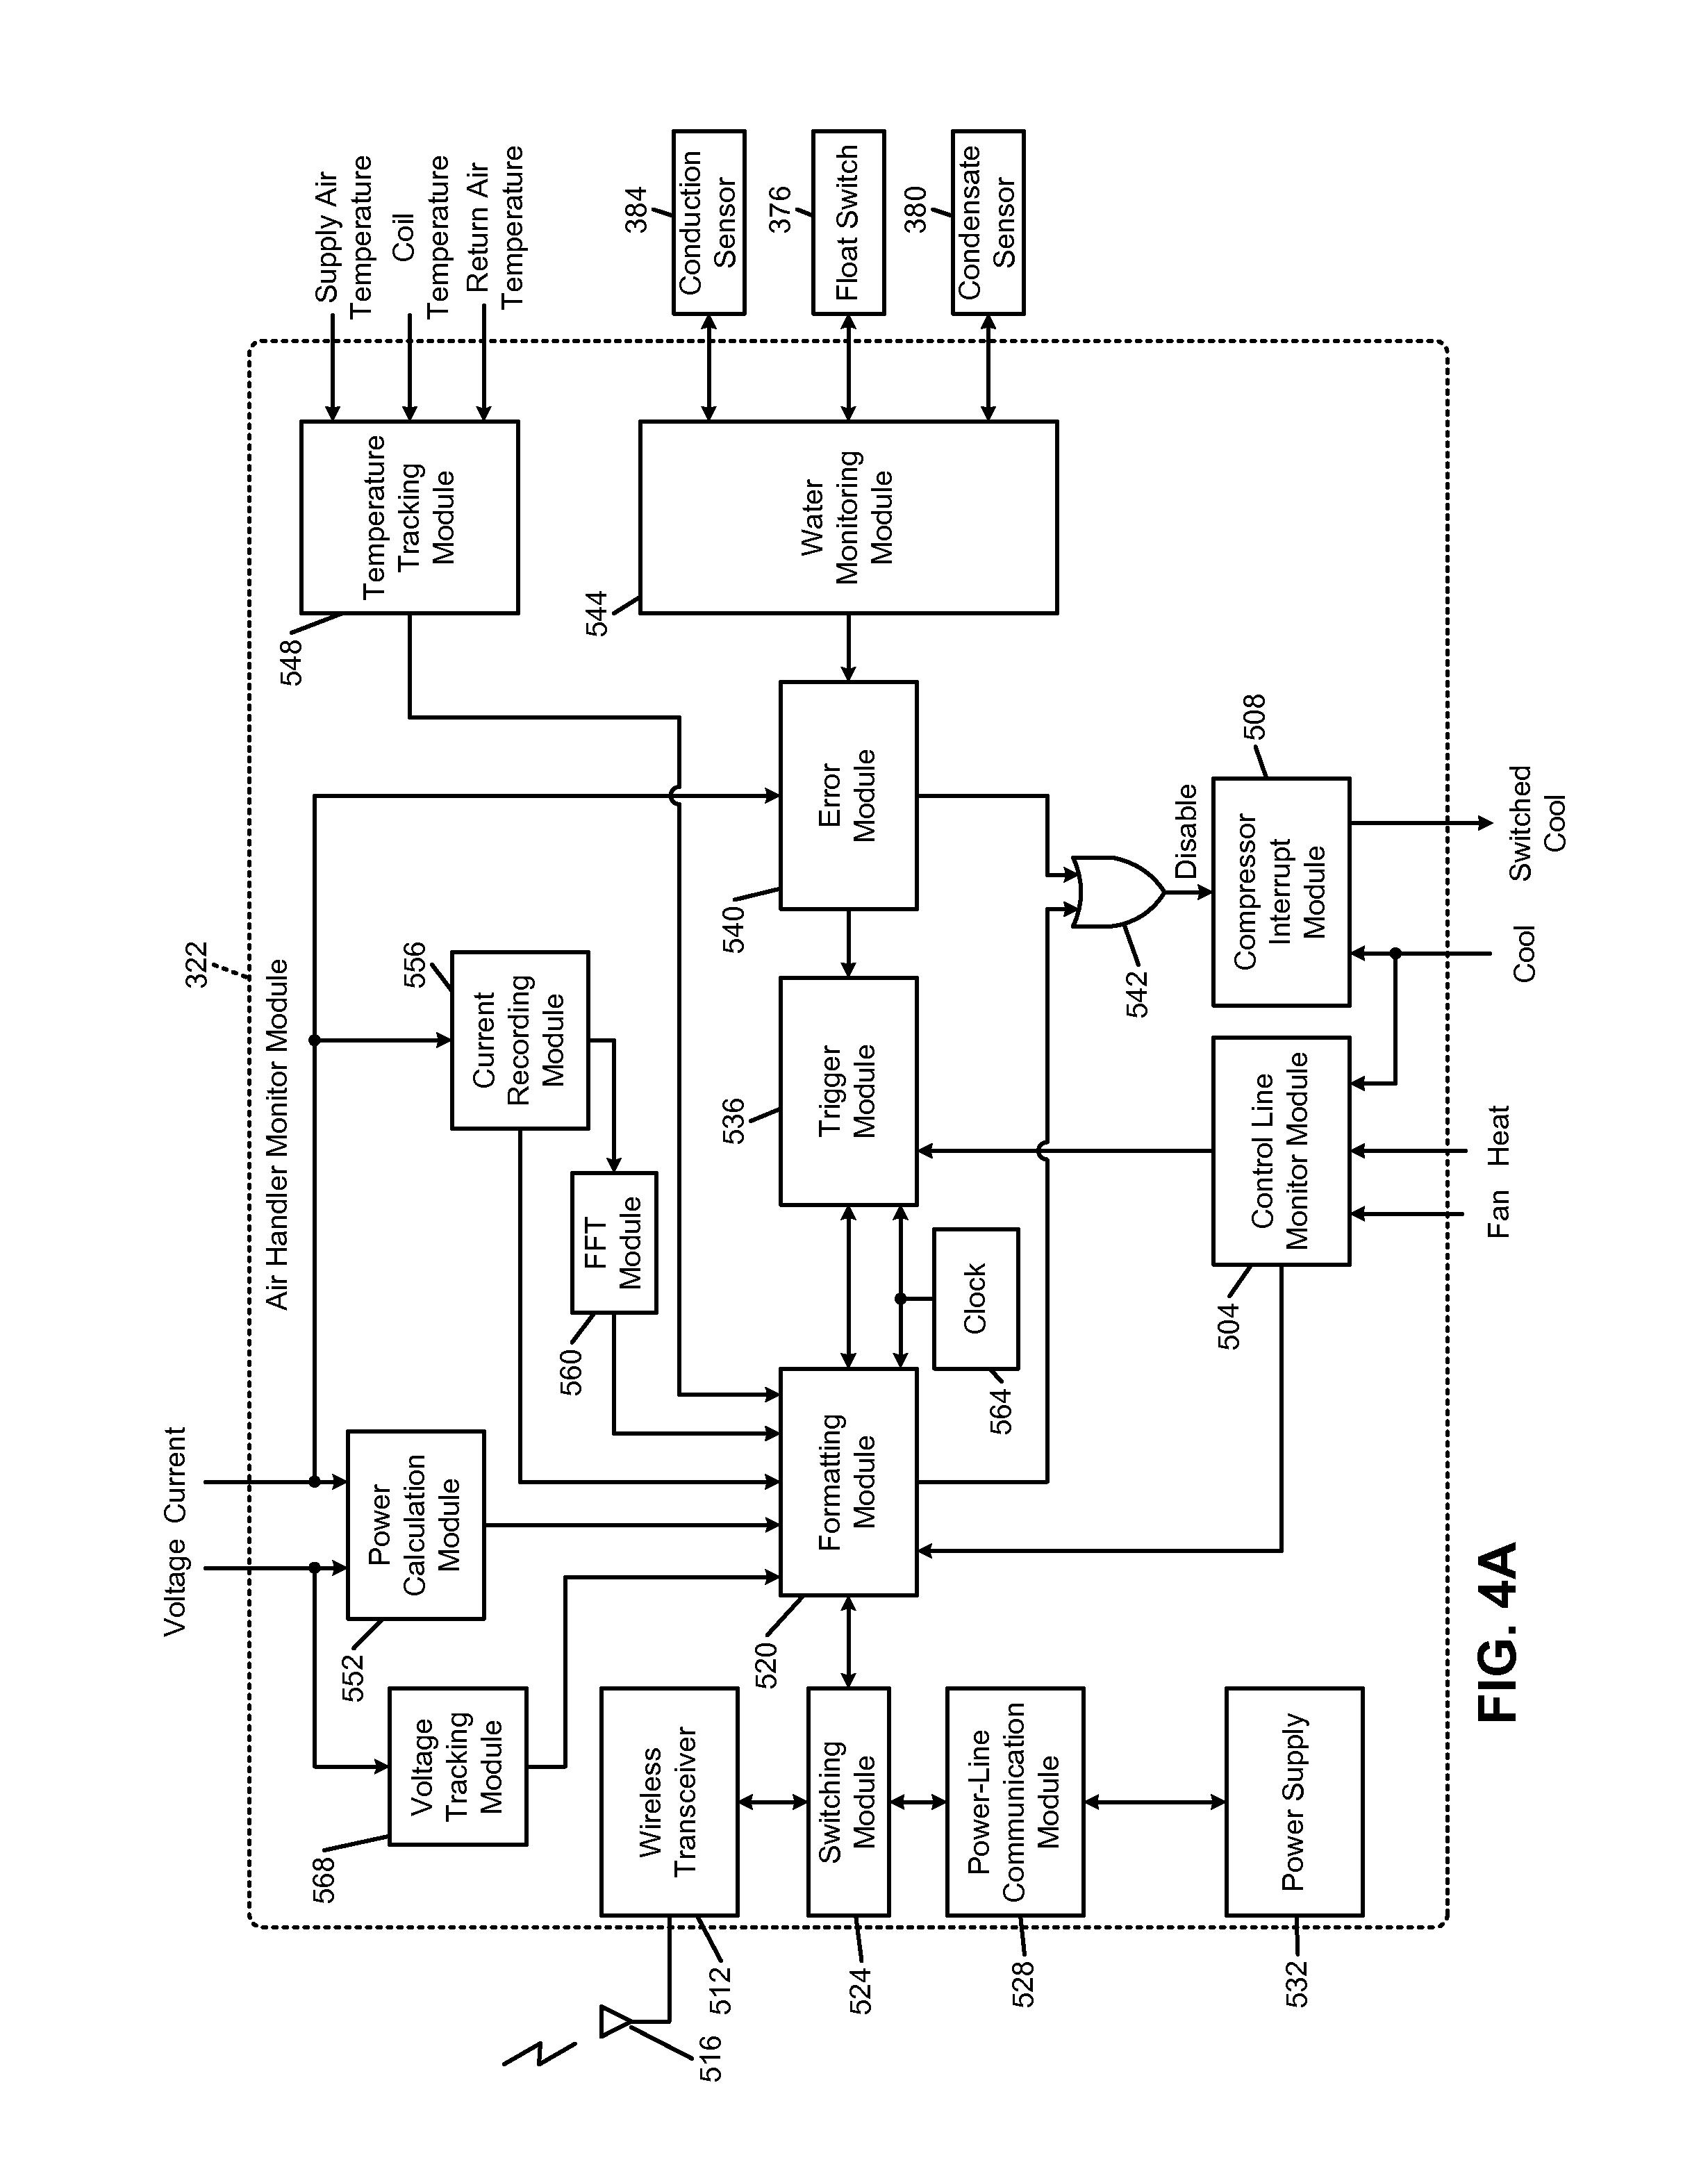 Patent US 9,638,436 B2